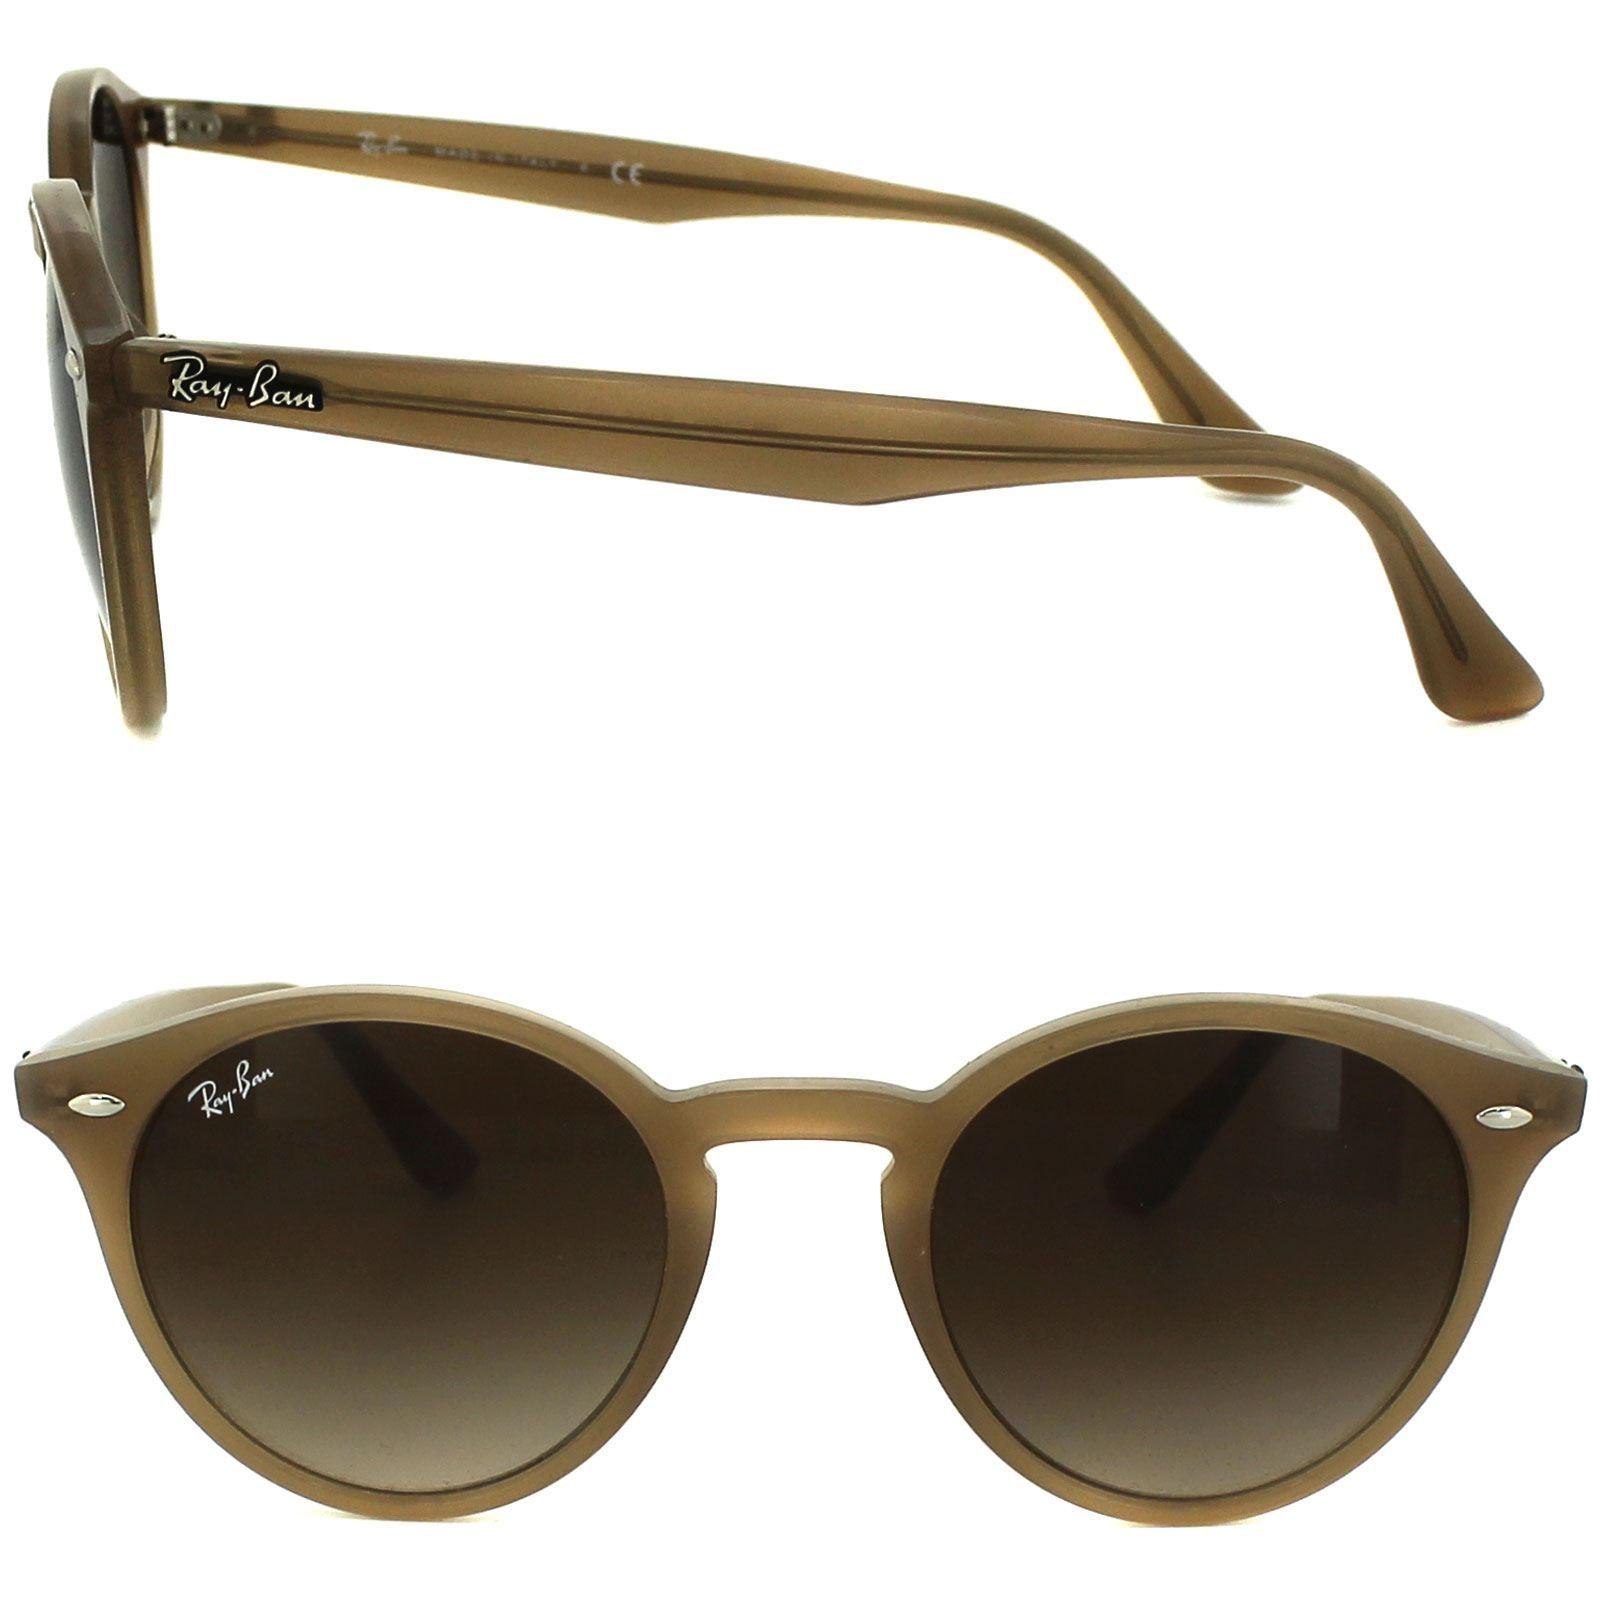 Ray-Ban Sunglasses 2180 616613 Turtledove Brown Brown Gradient